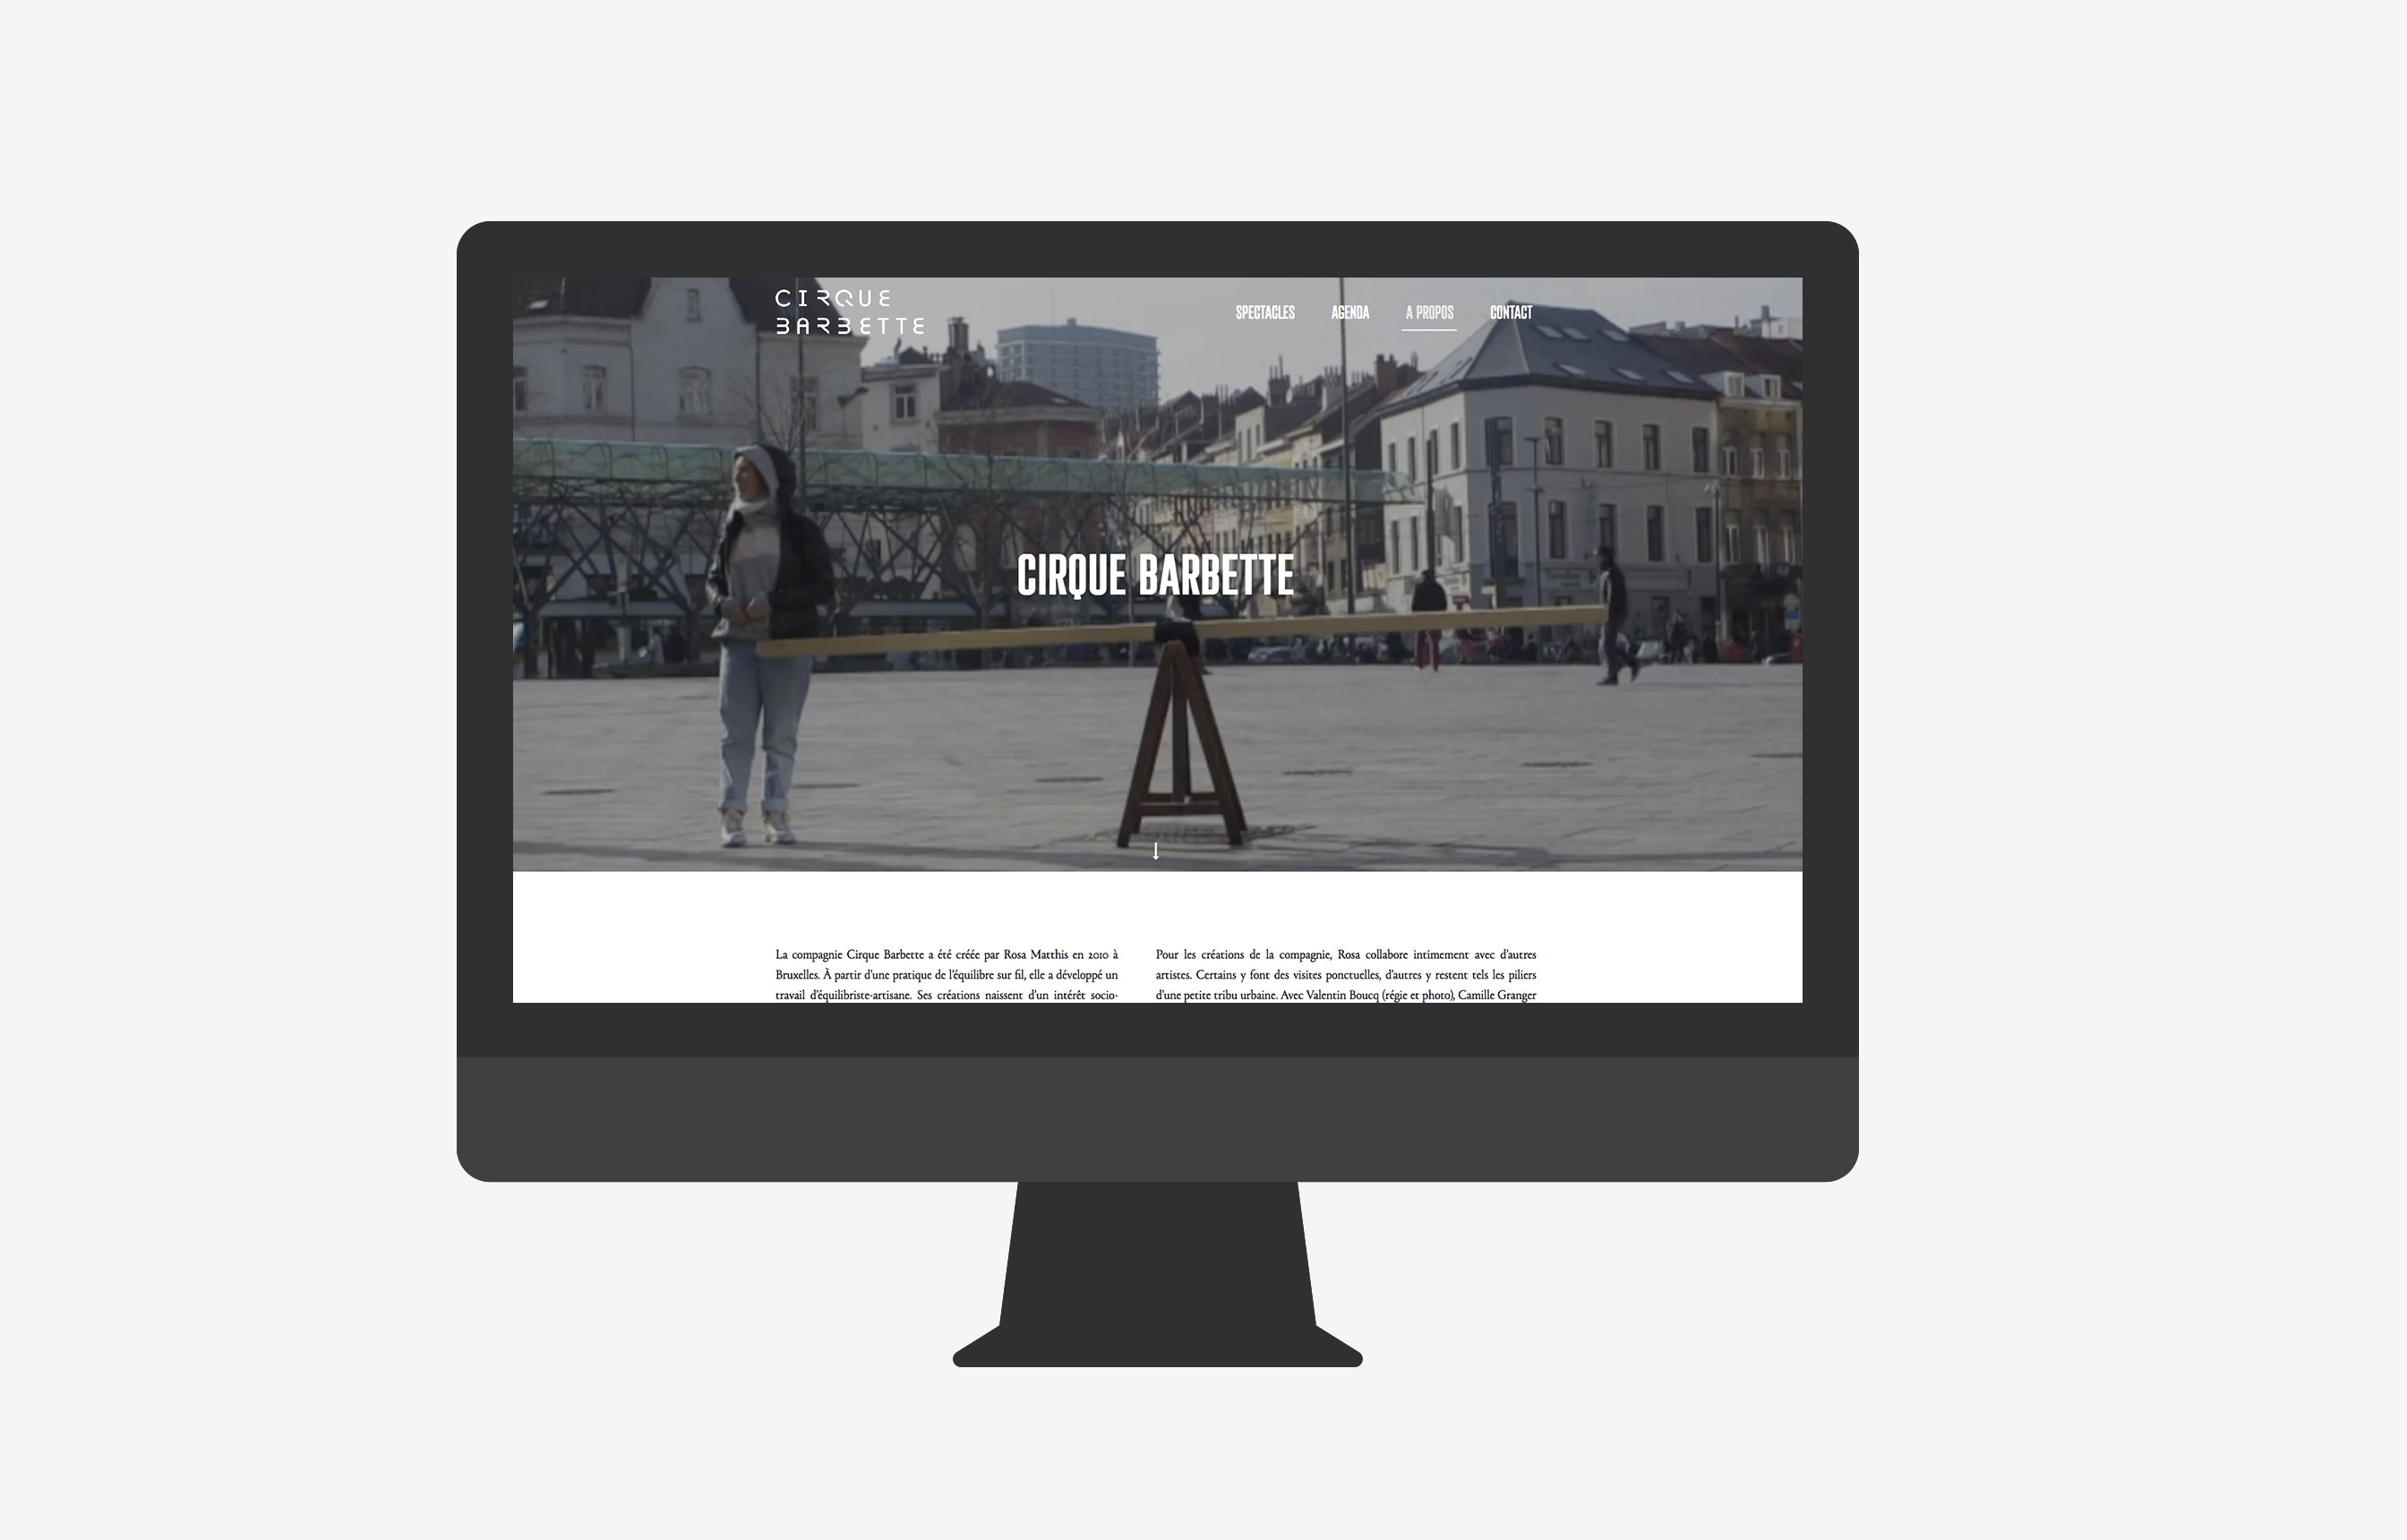 05-cirque-barbette-pikteo-webdesign-graphic-design-freelance-paris-bruxelles-londres